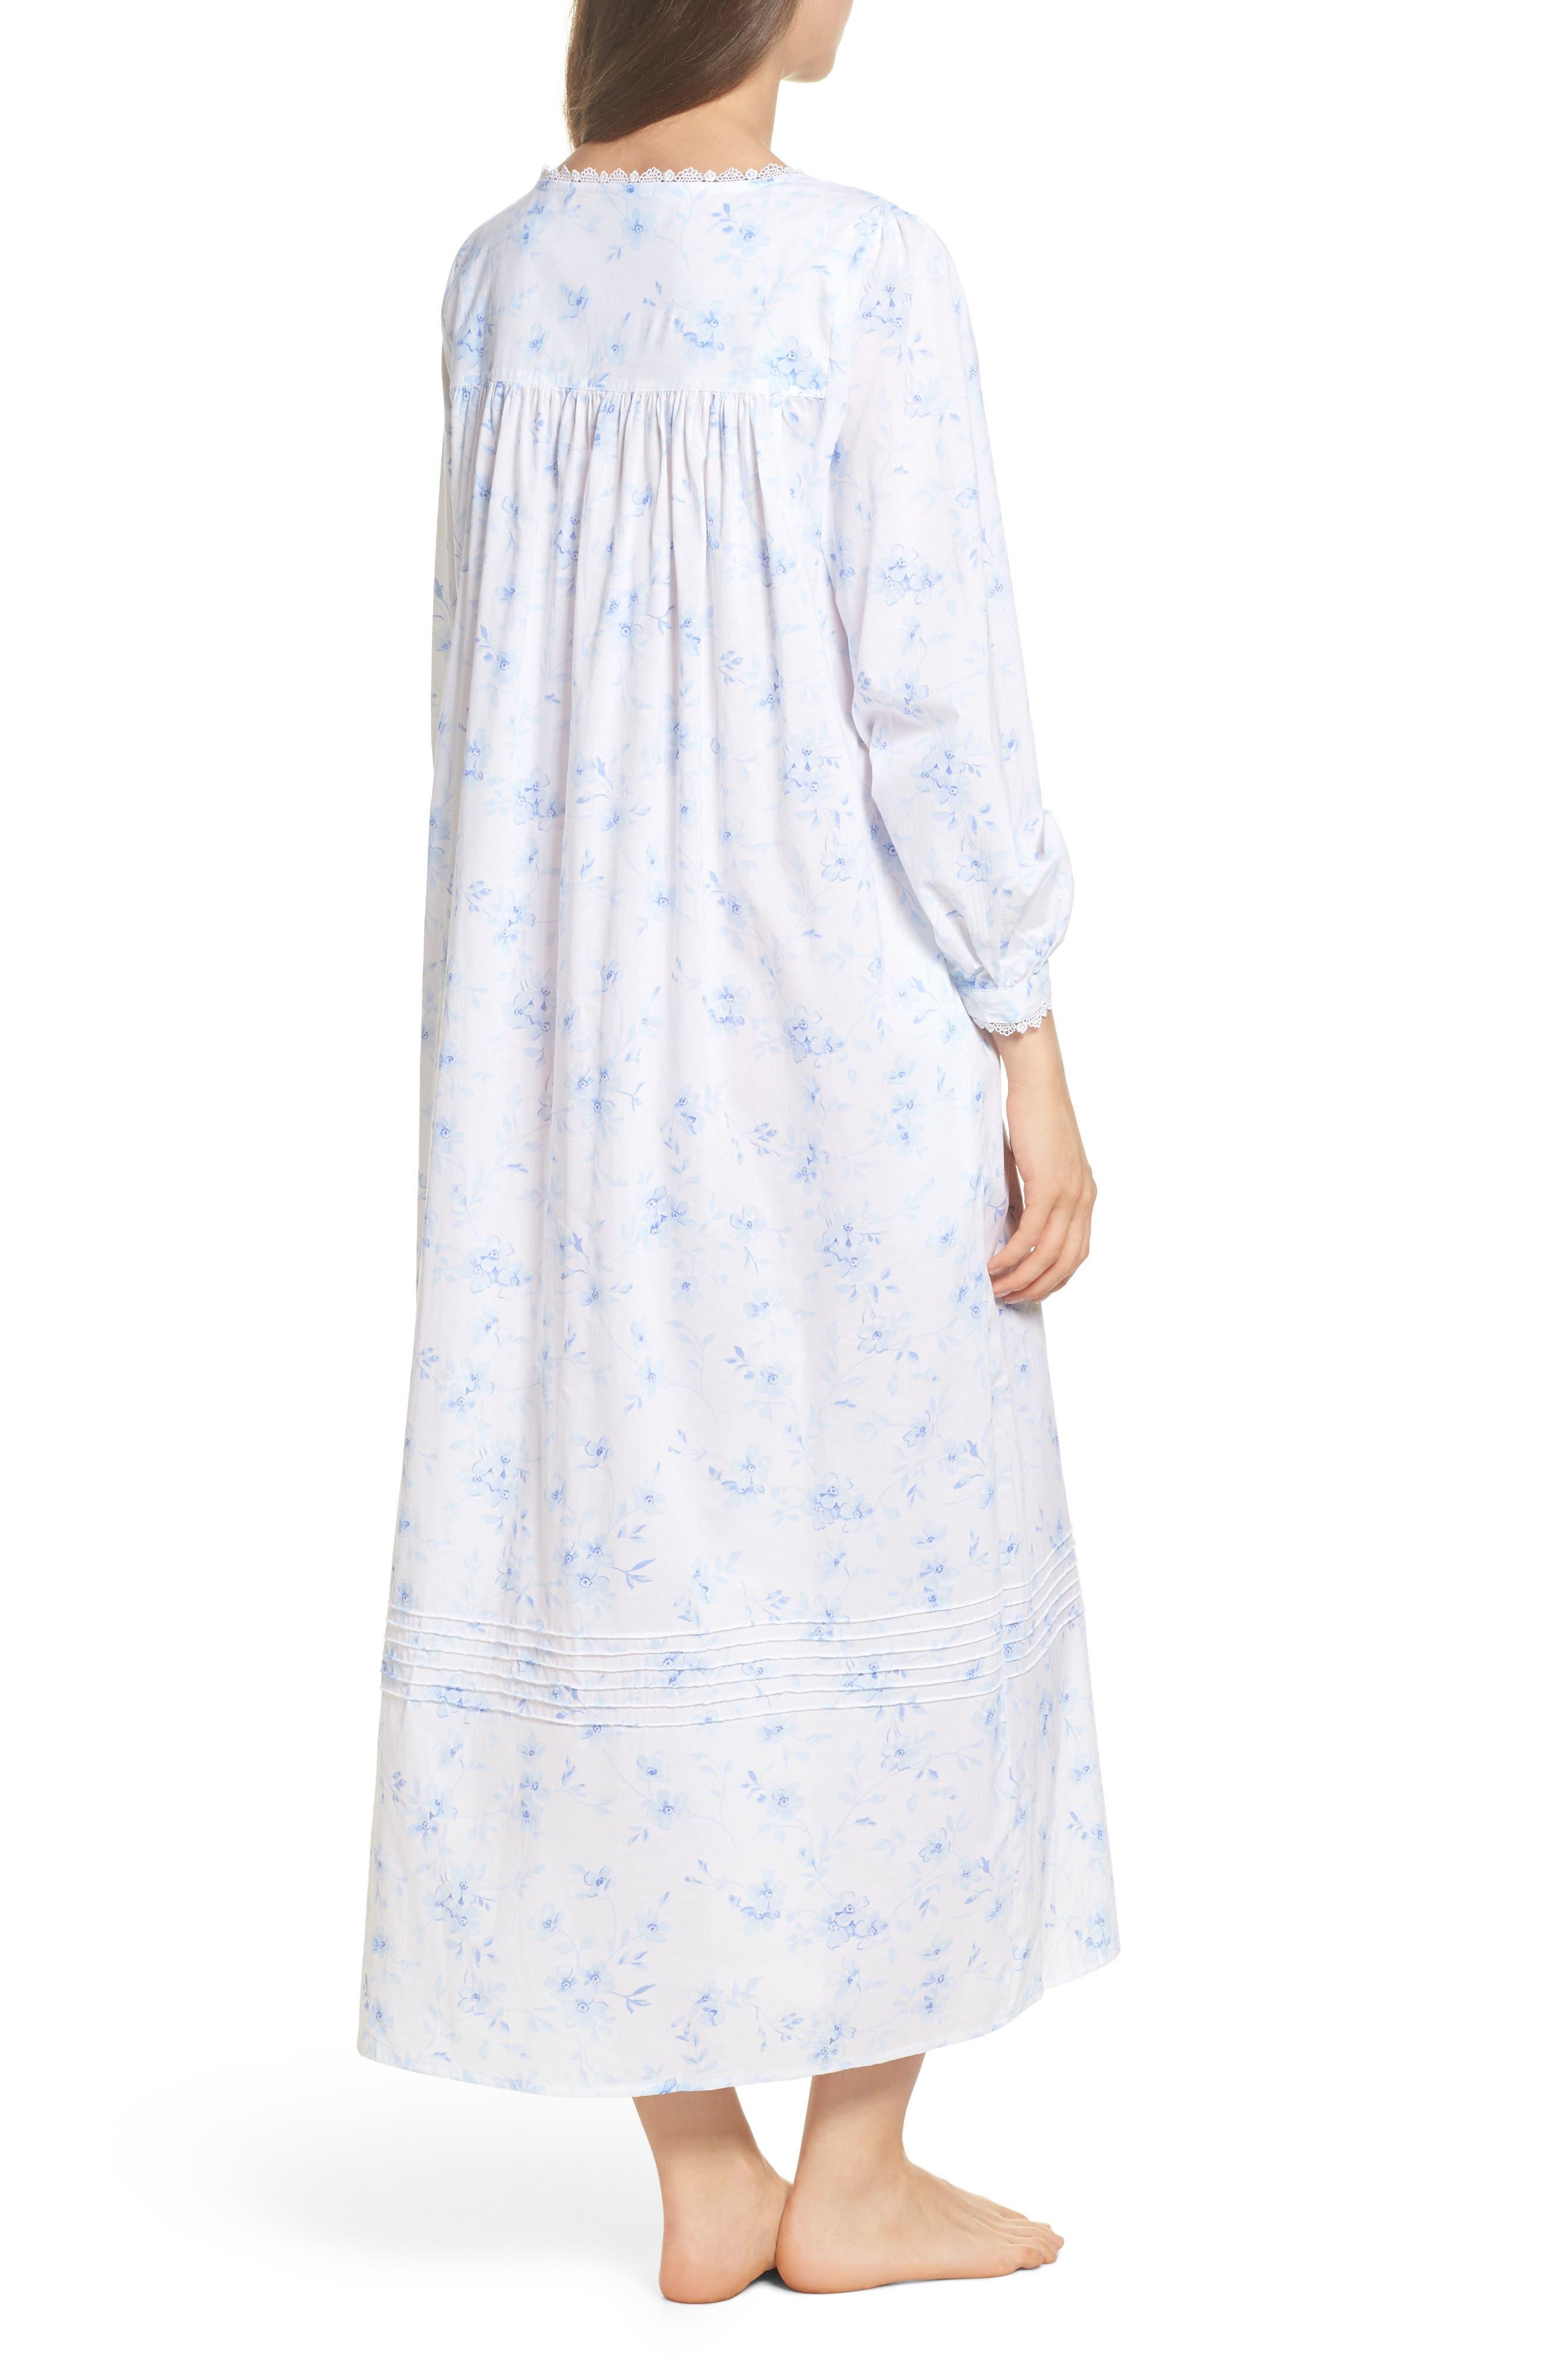 Cotton Lawn Ballet Nightgown,                             Alternate thumbnail 2, color,                             White Mono Floral